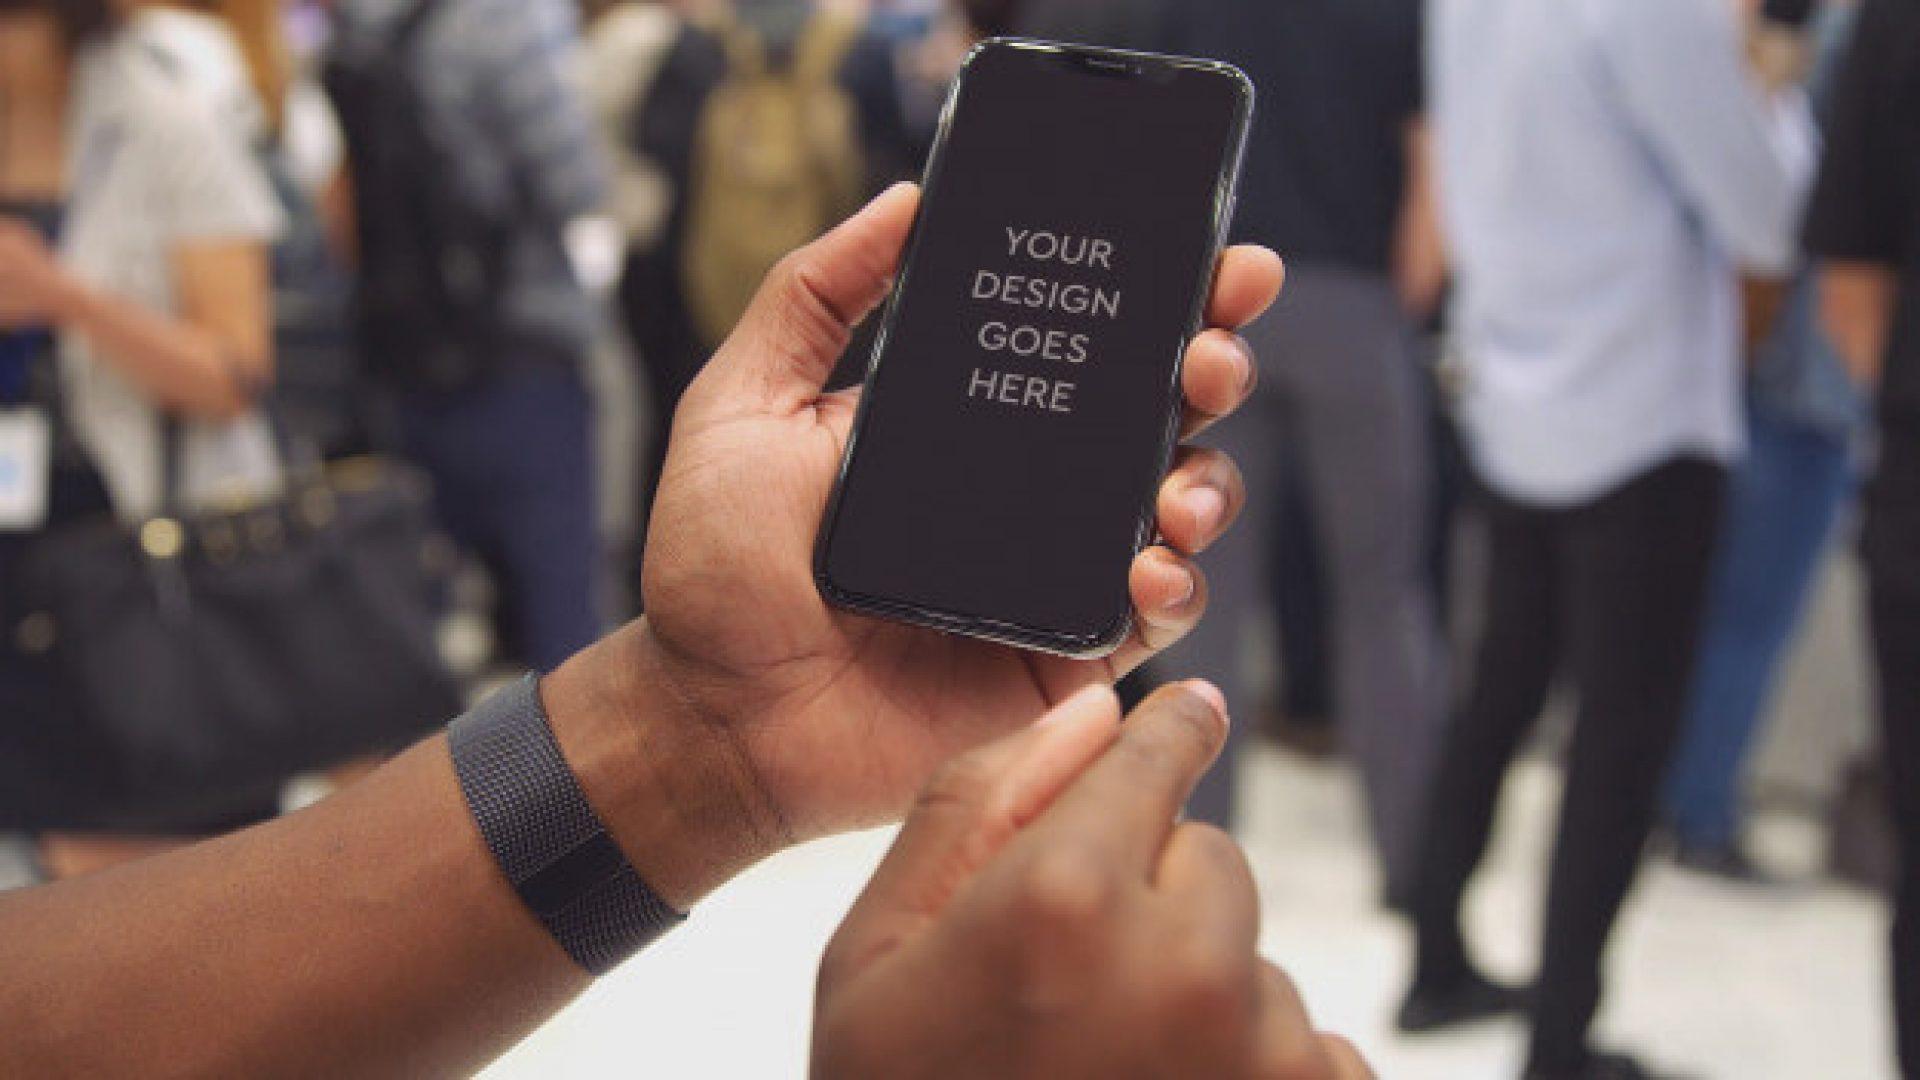 phone-display-mockup_7939-4495